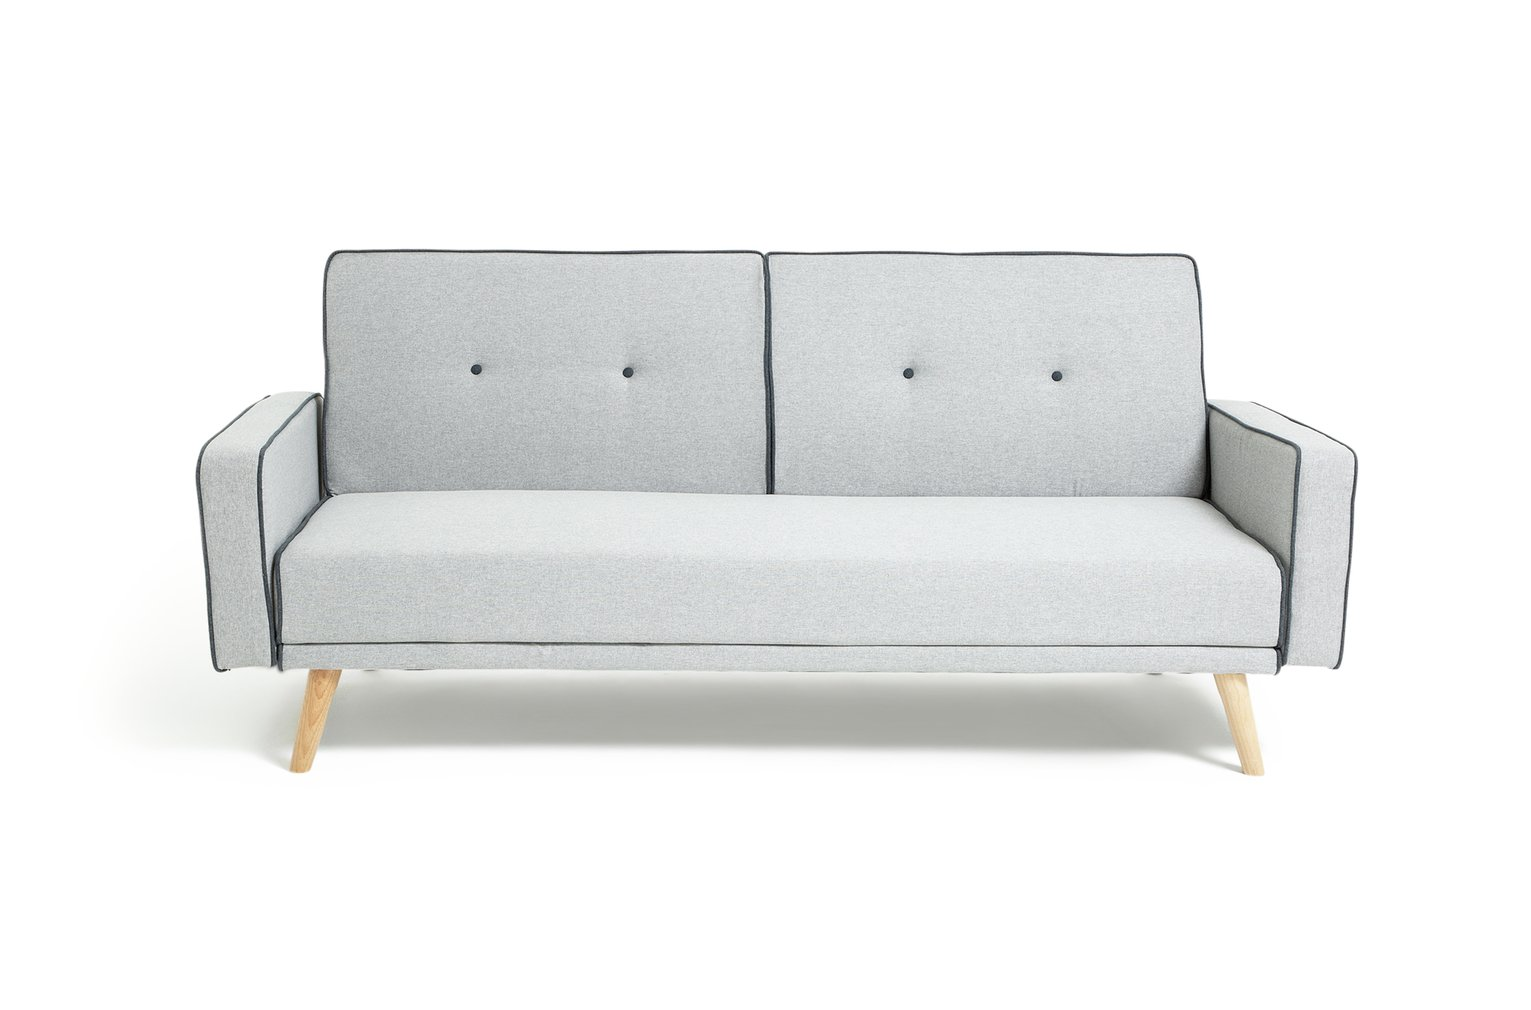 Argos Home Frankie 2 Seater Clic Clac Sofa Bed - Grey